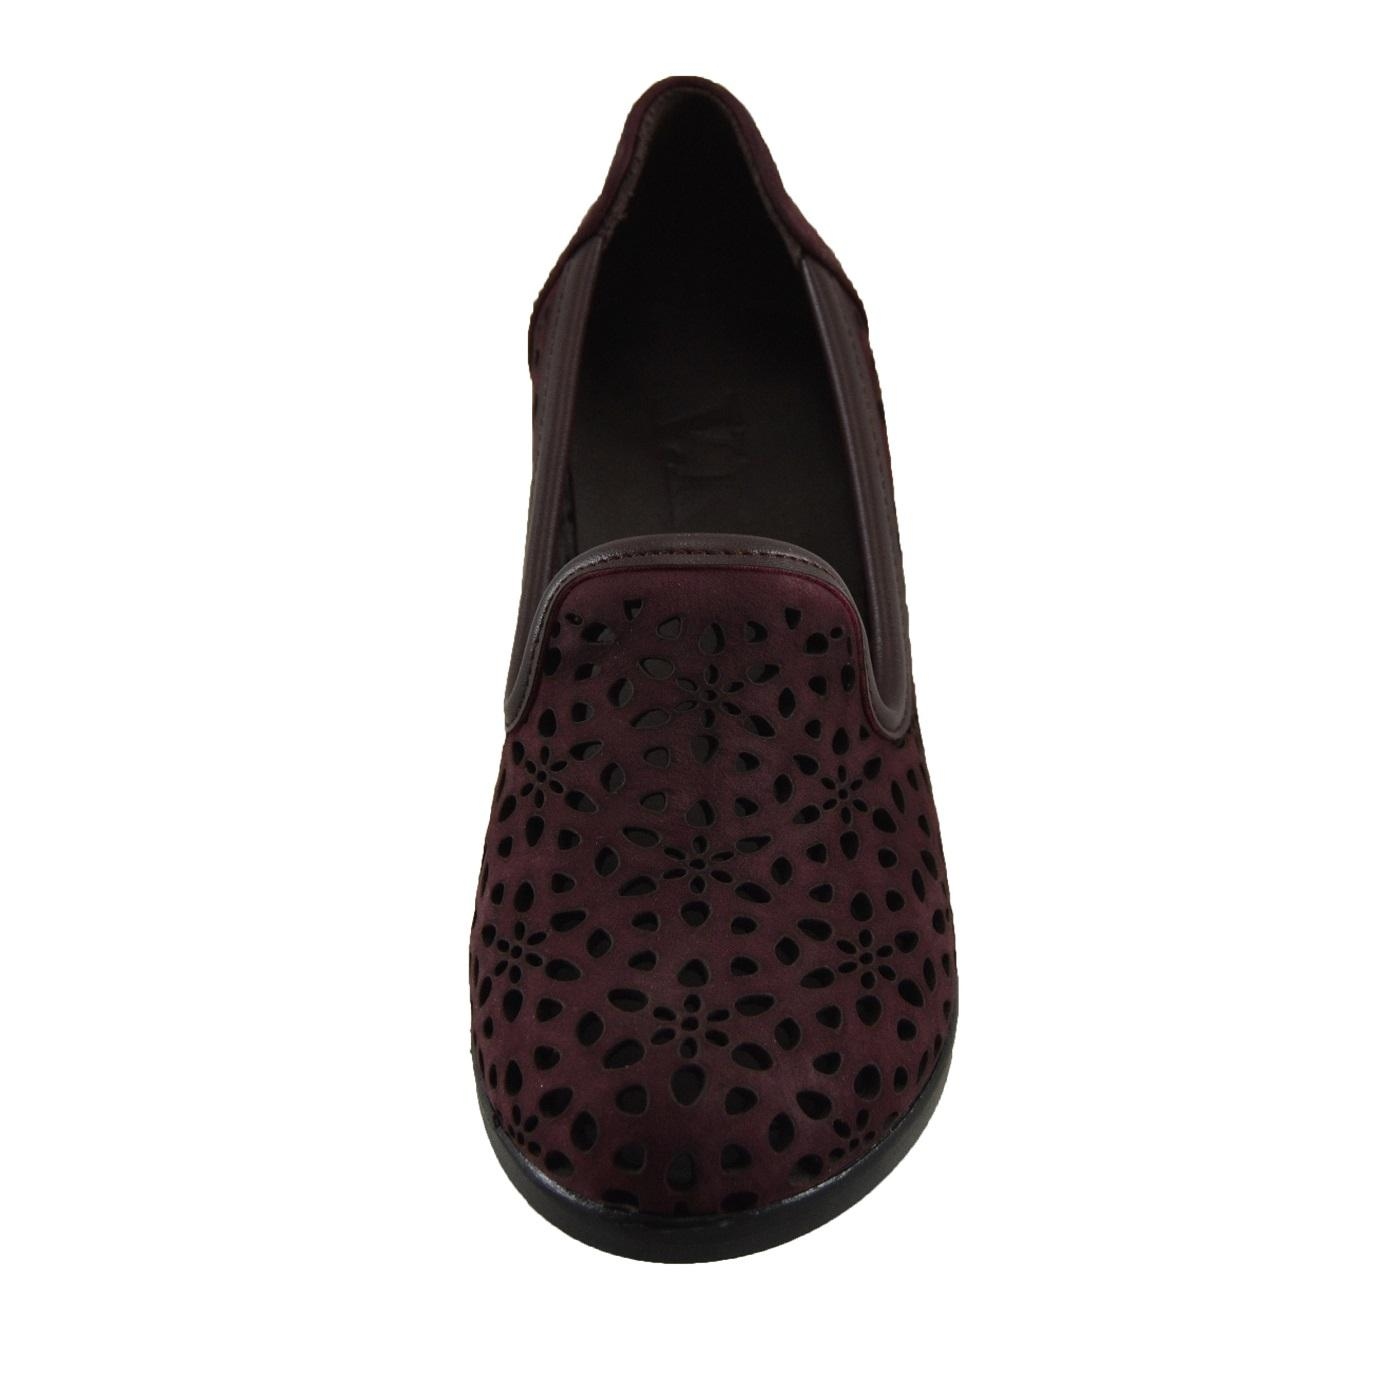 کفش زنانه کد 456 -  - 4